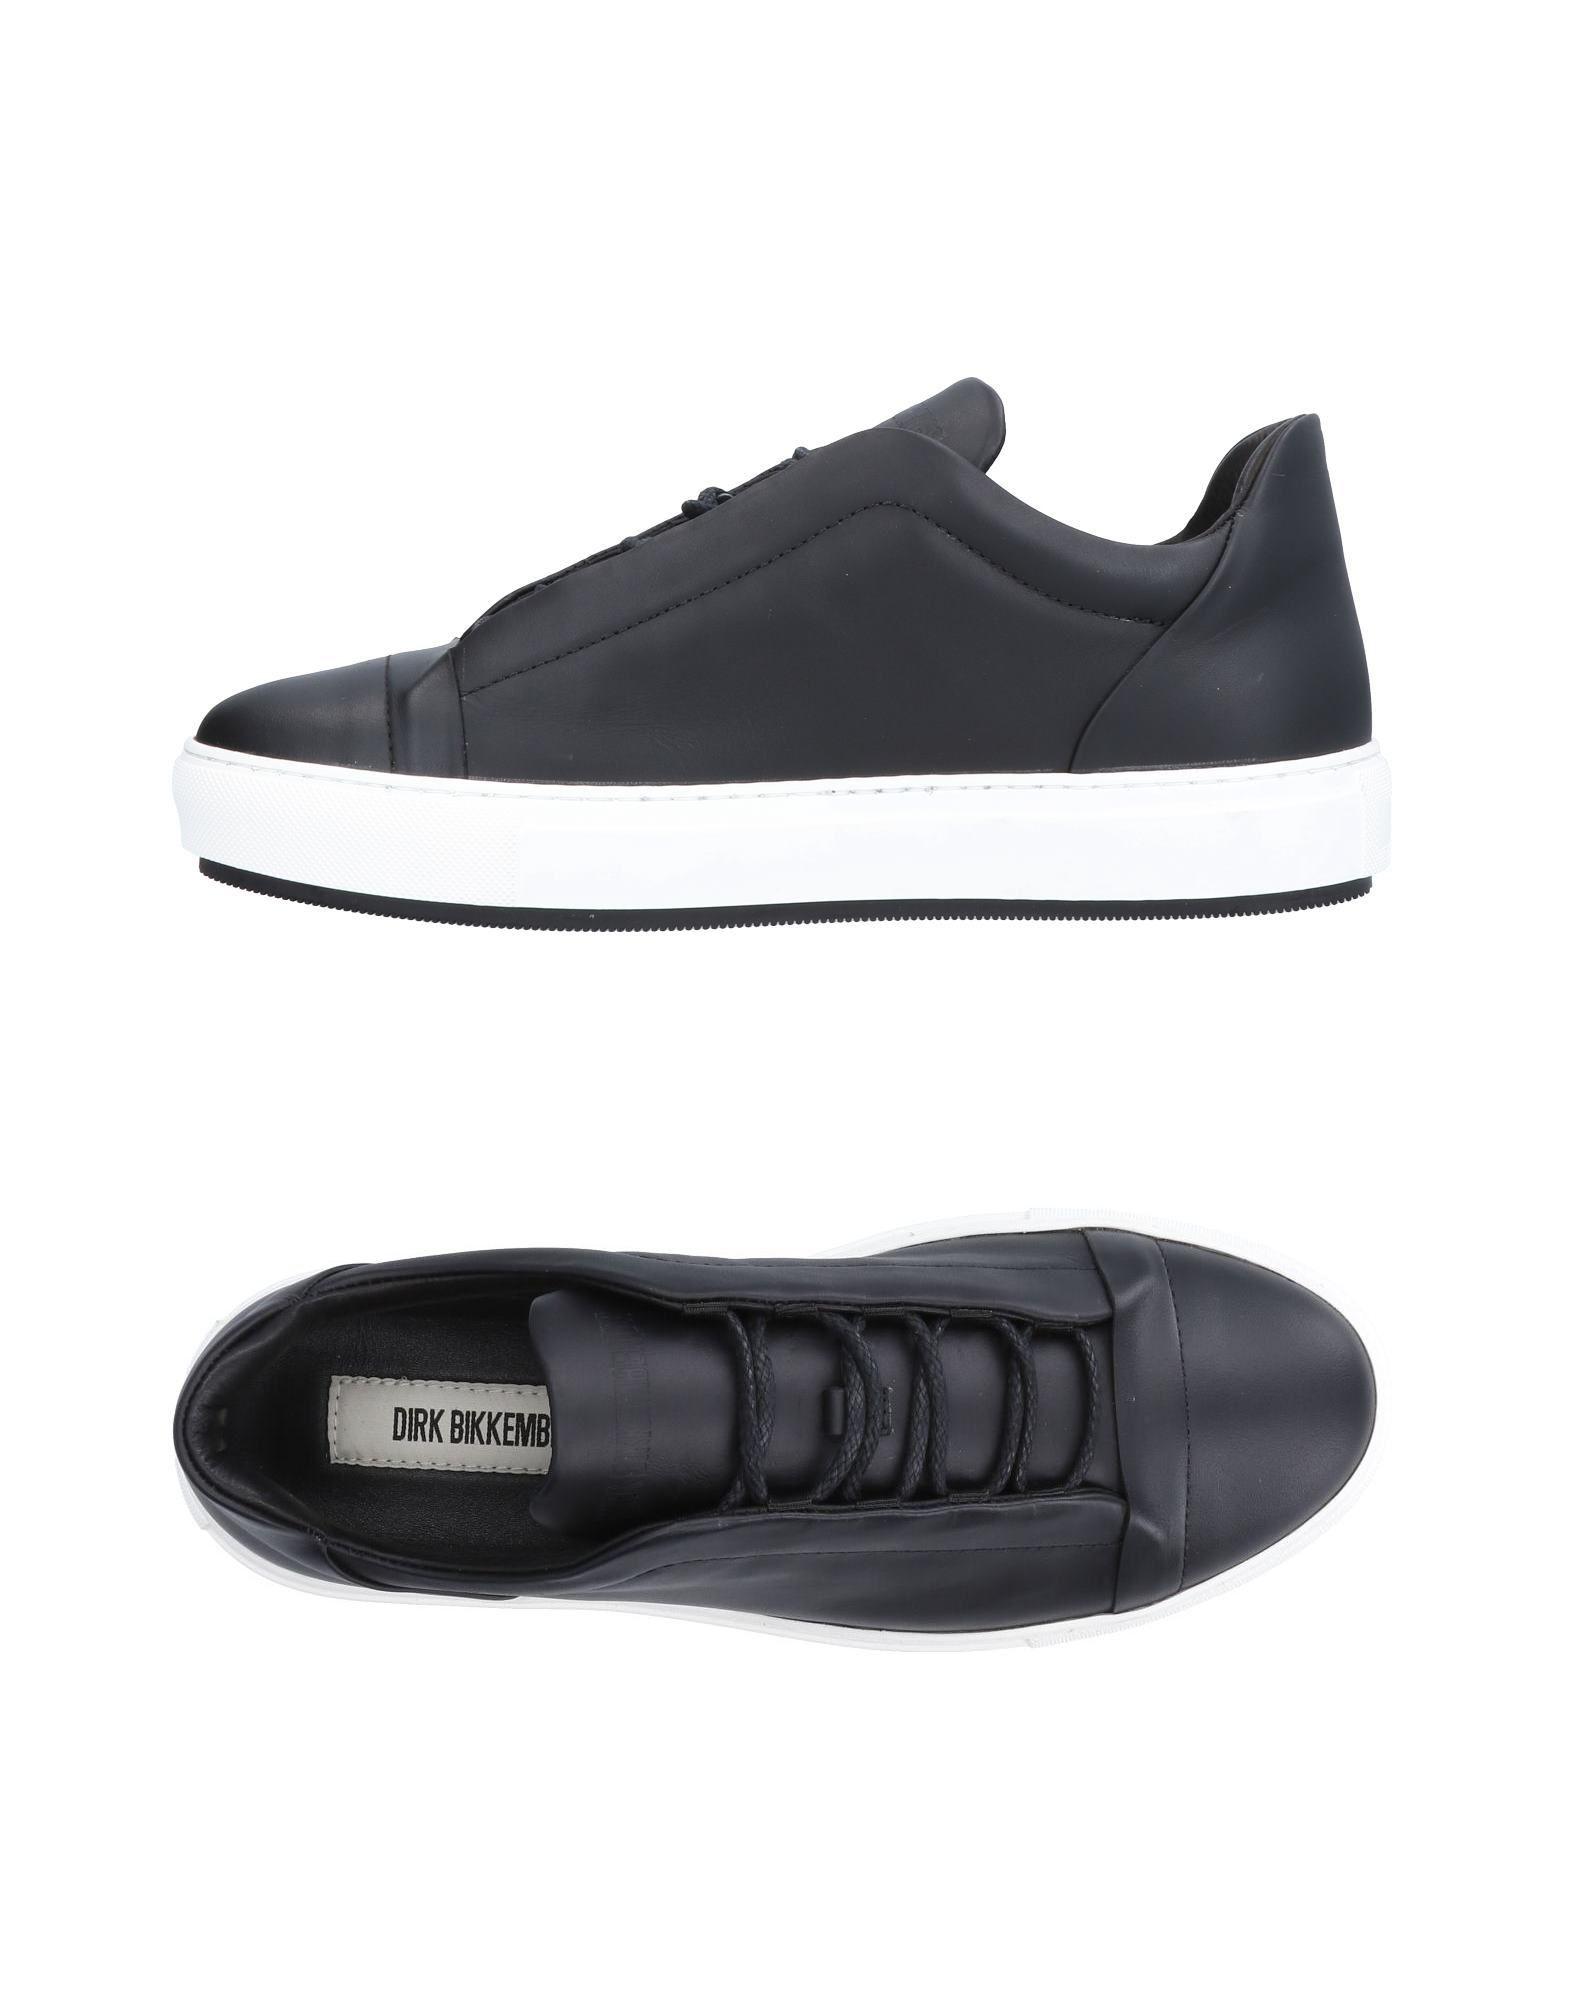 Sneakers Dirk Bikkembergs Uomo - 11517399VX